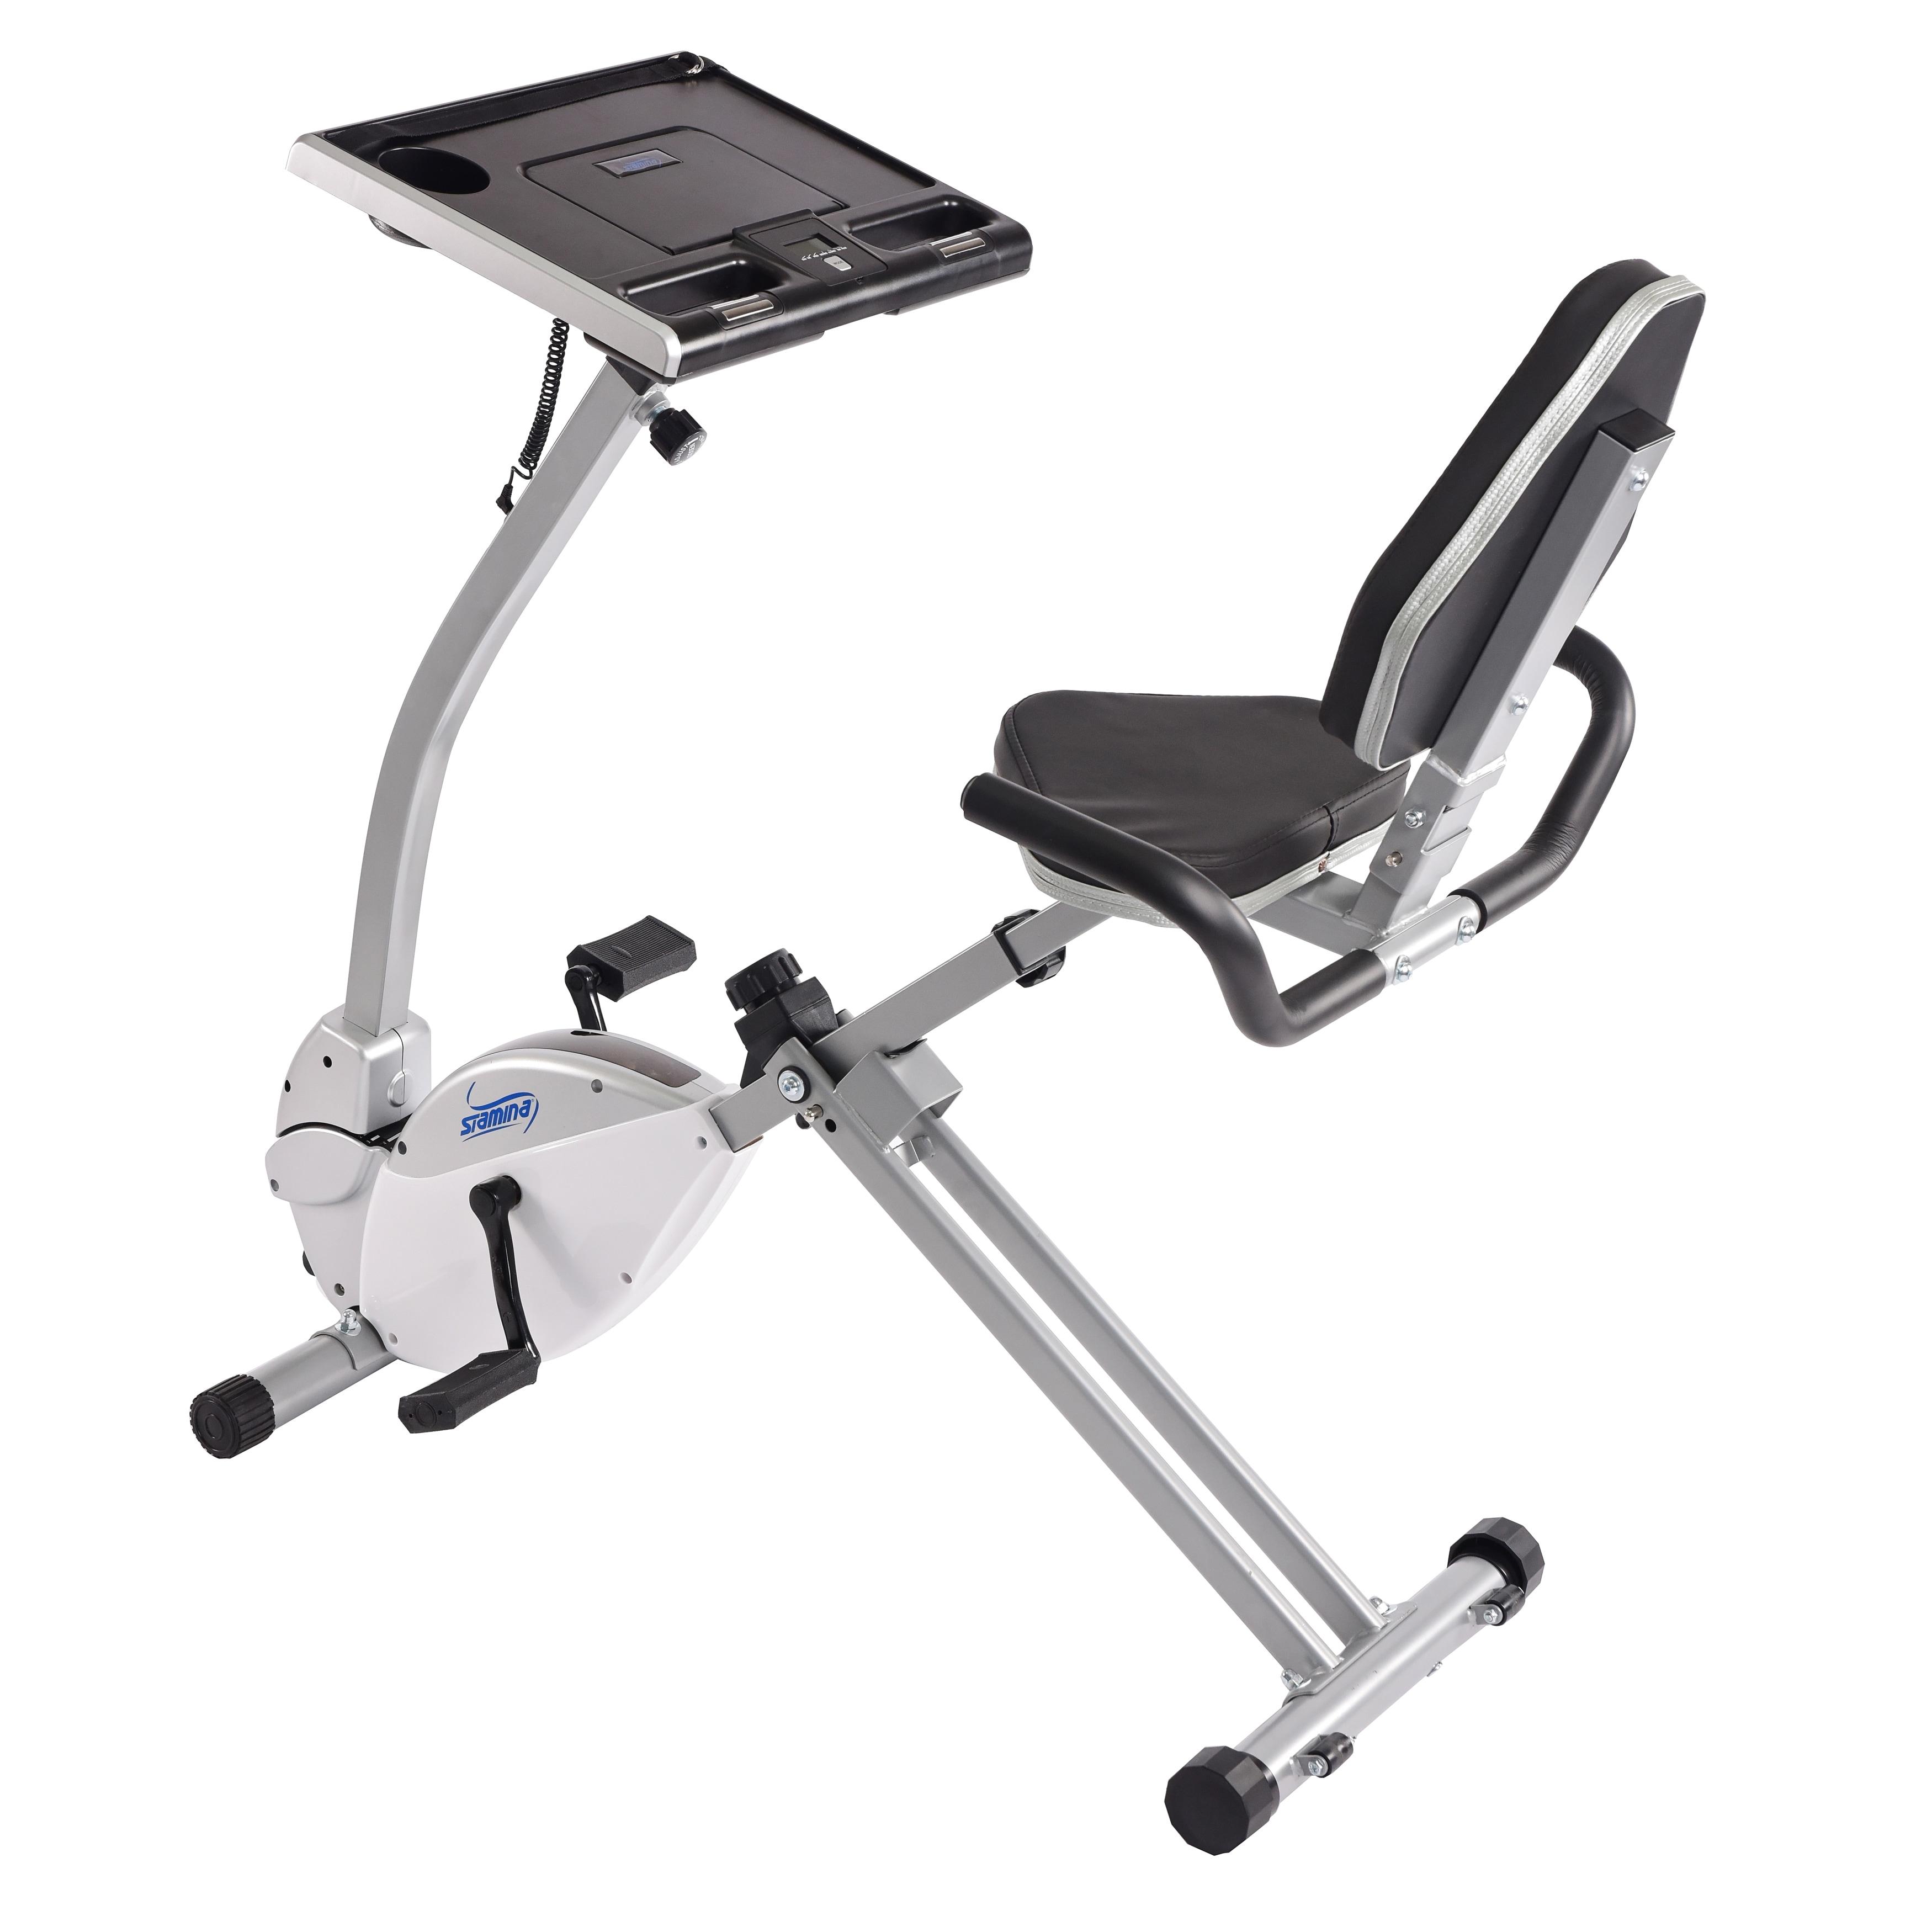 under machines equipment deskcycle exercise fitness gizmos desk